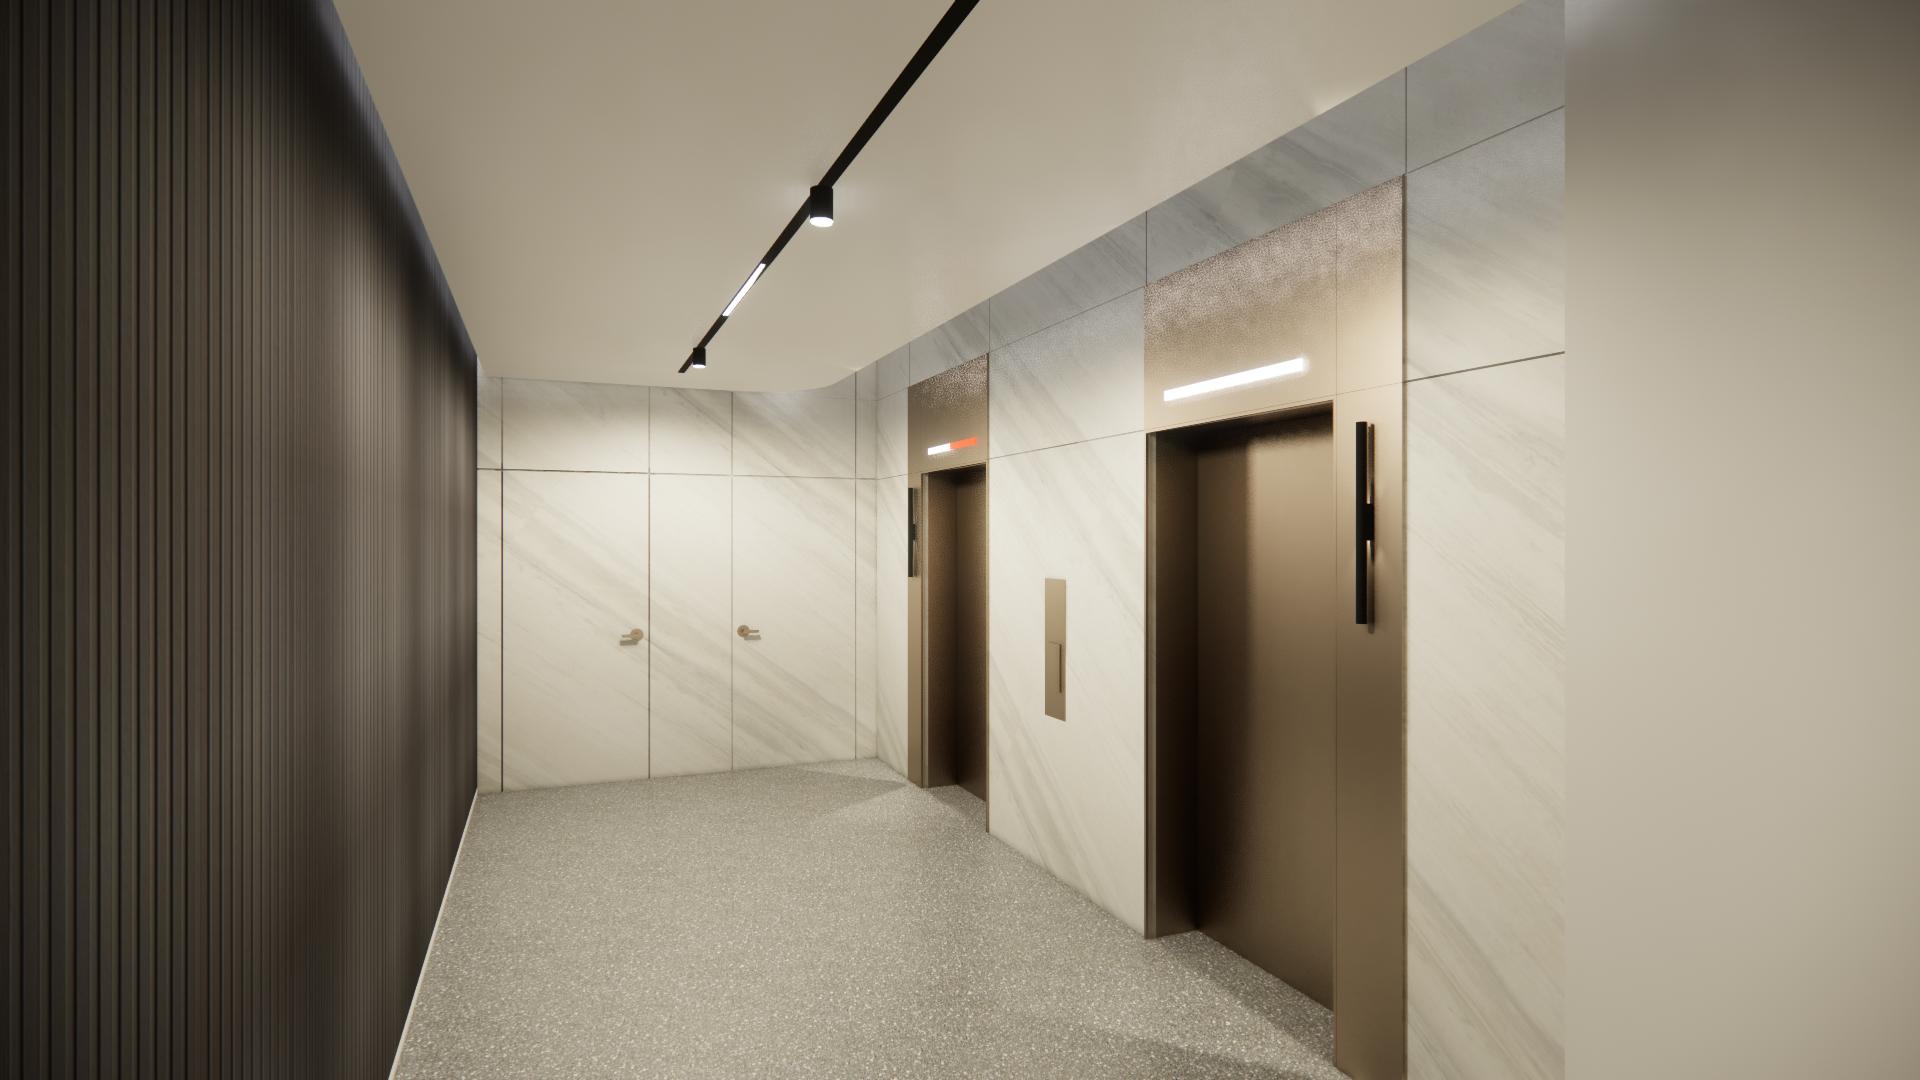 LOBBY PERSPECTIVE - ELEVATOR